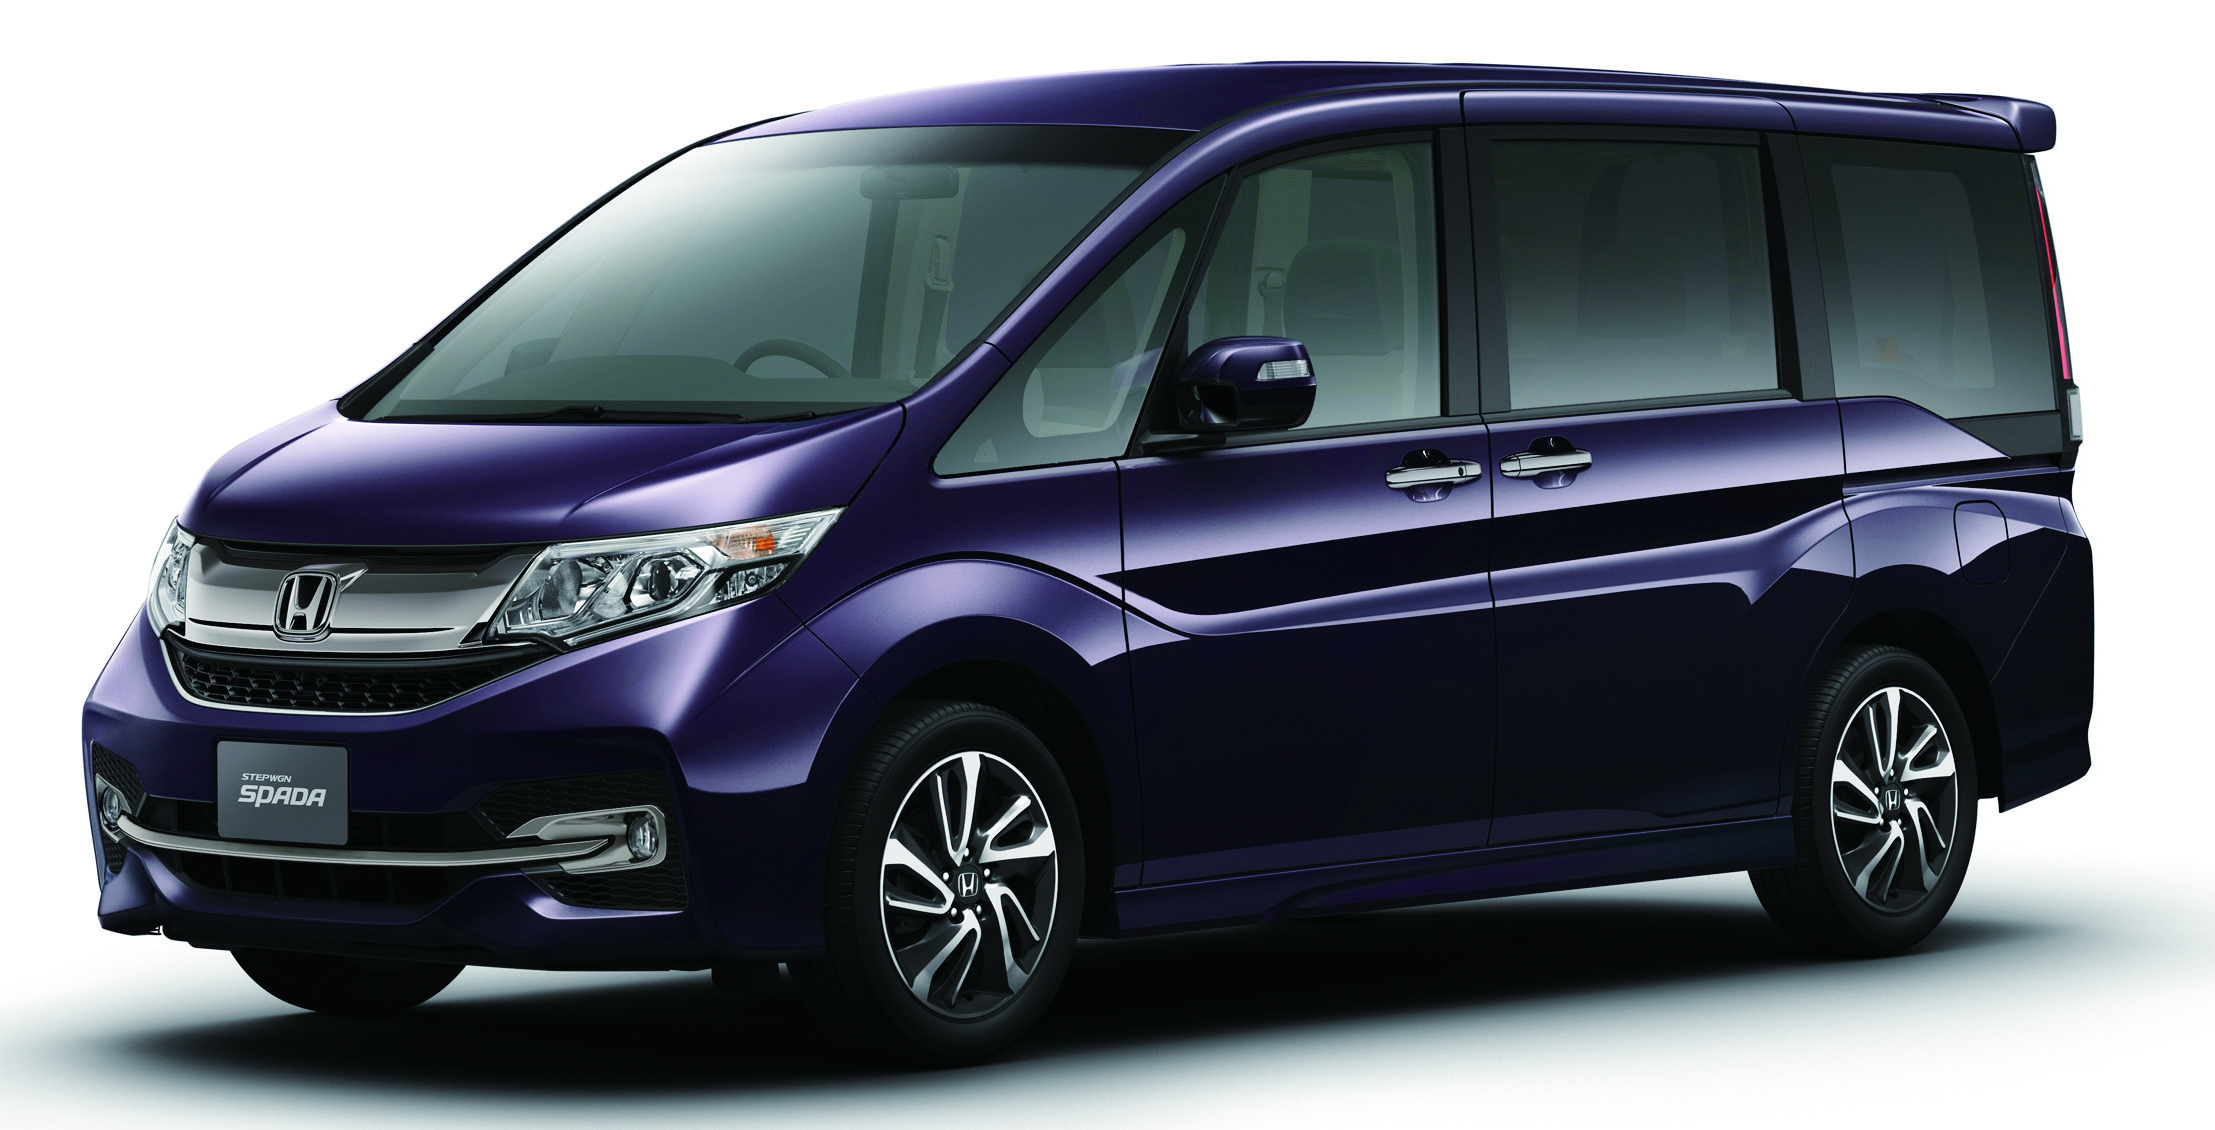 2015 Honda StepWGN goes on sale in Japan